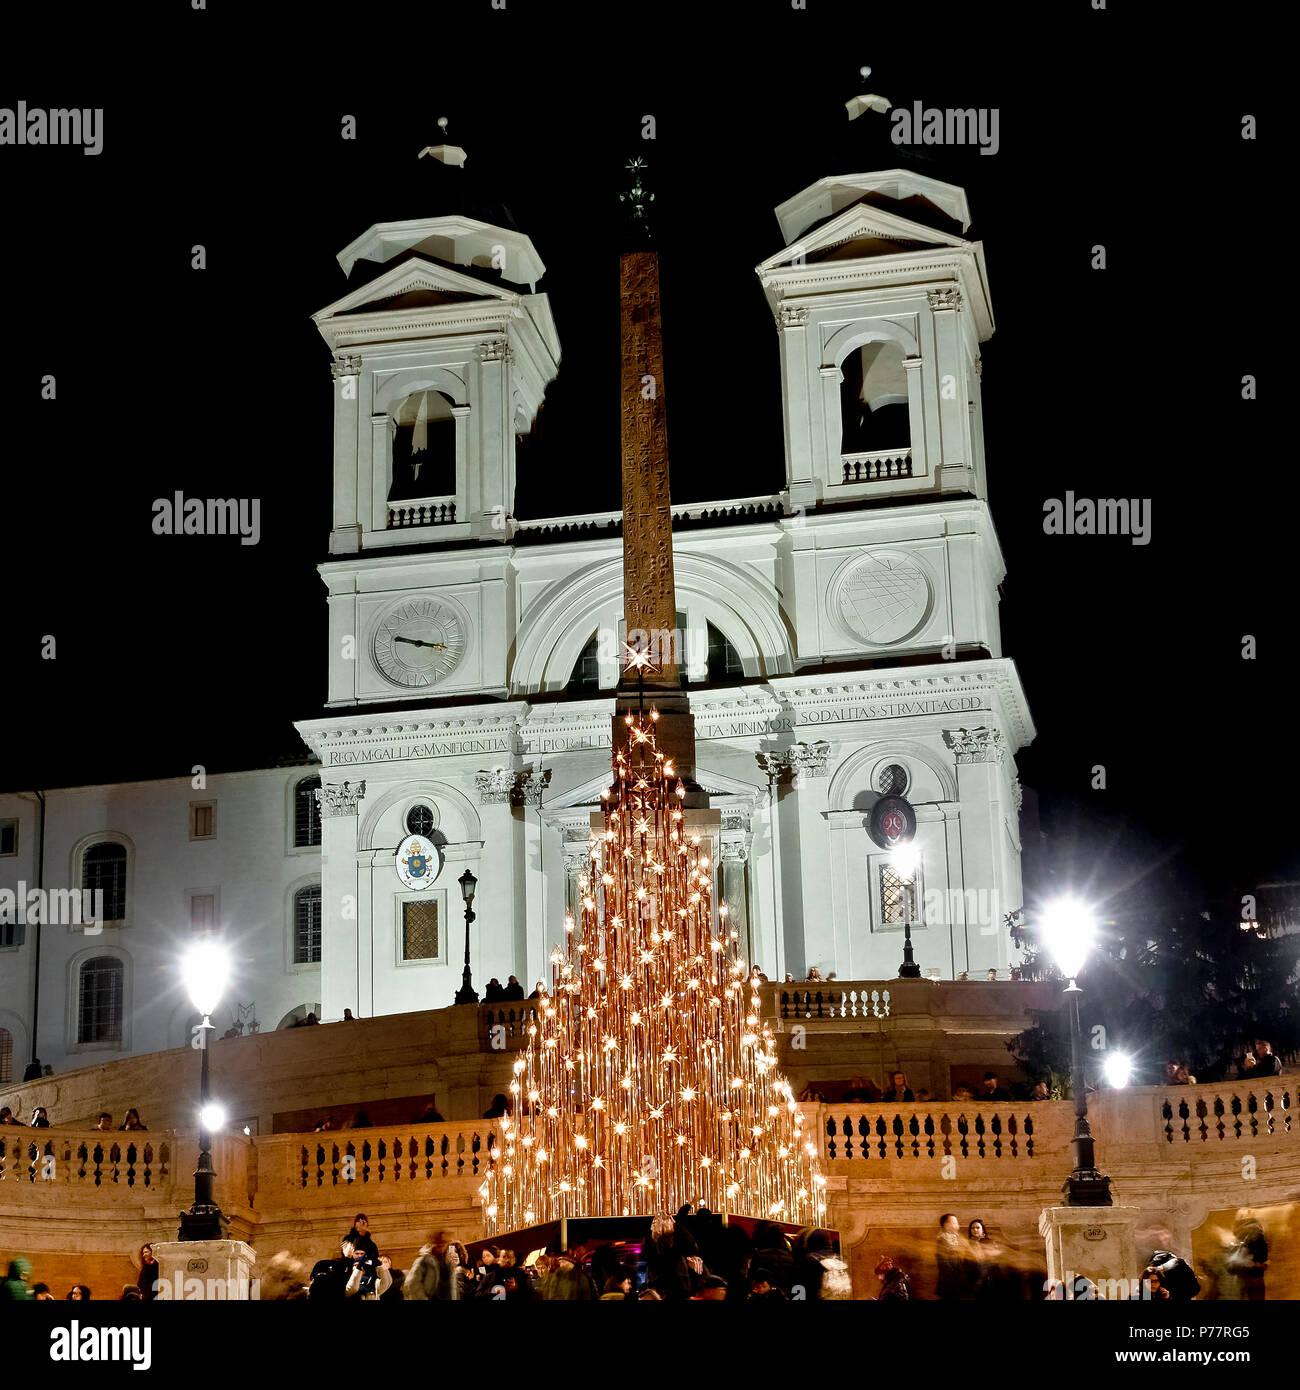 Christmas led tree, at the Spanish Steps Square, Trinità dei Monti, Piazza di Spagna. Christmastime, winter season. Rome, Italy, Europe. - Stock Image